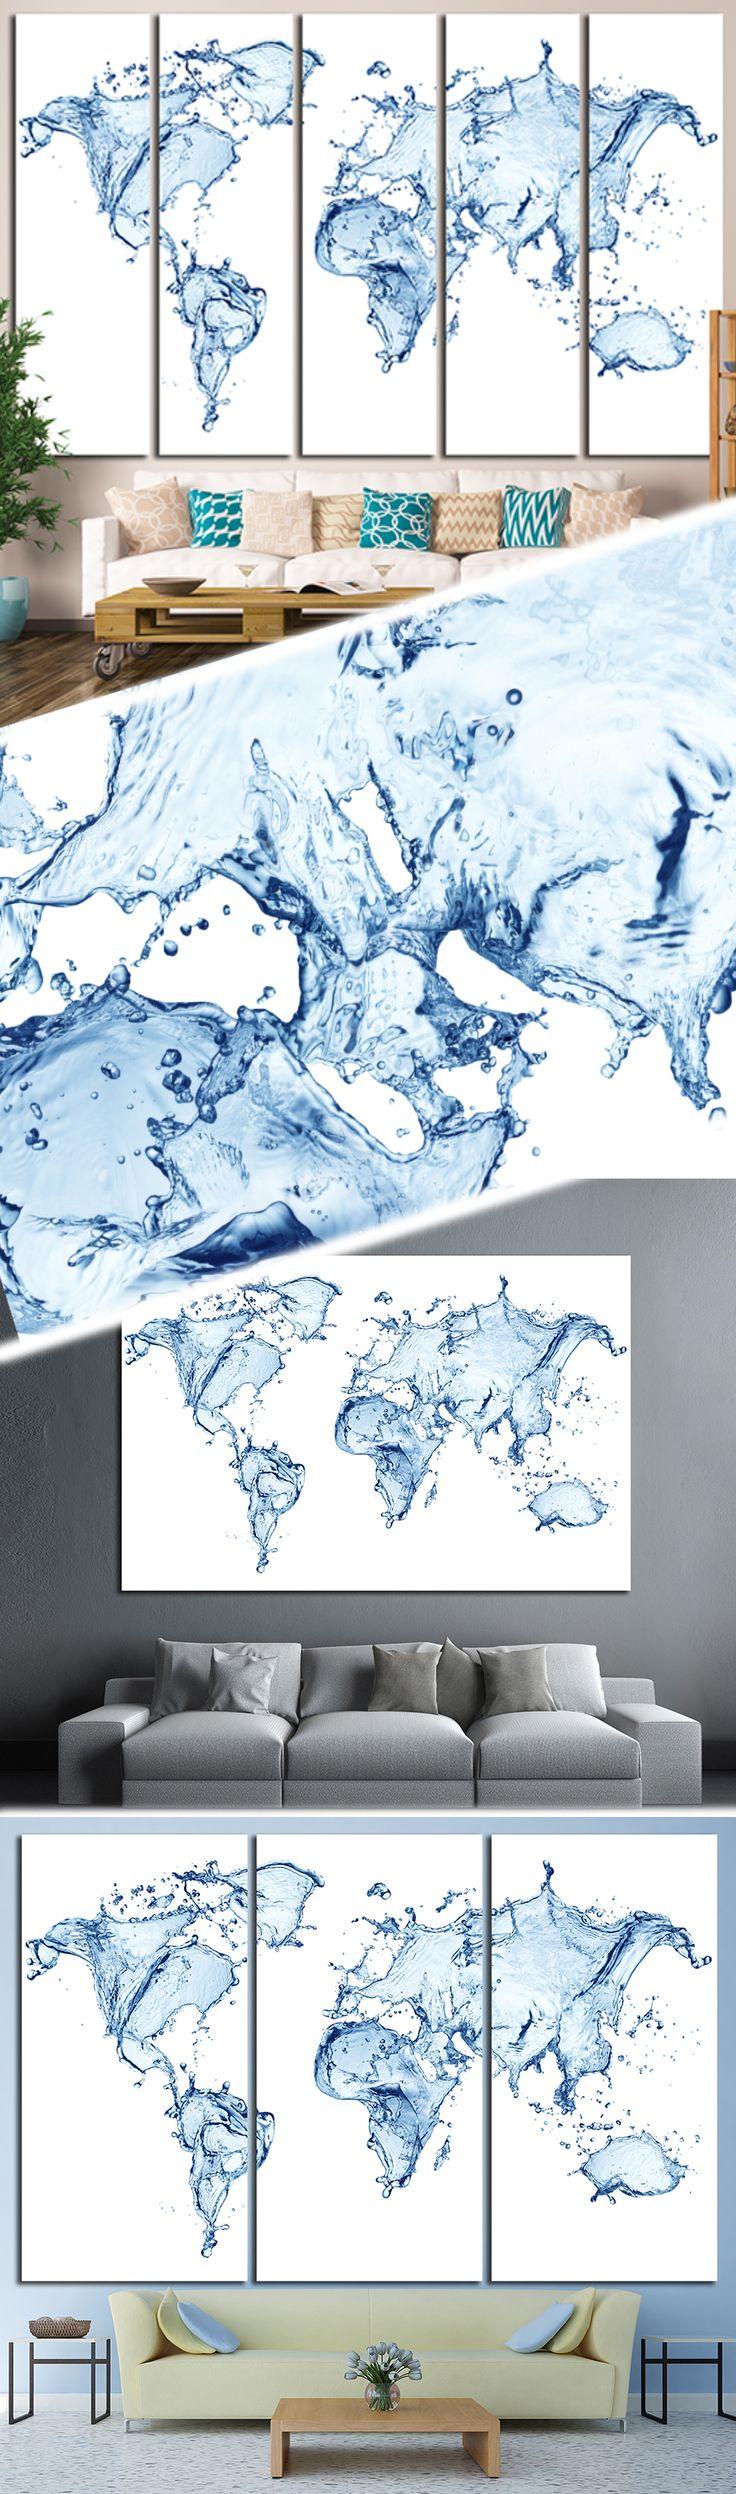 Water Splashes World Map 1452 Canvas Print